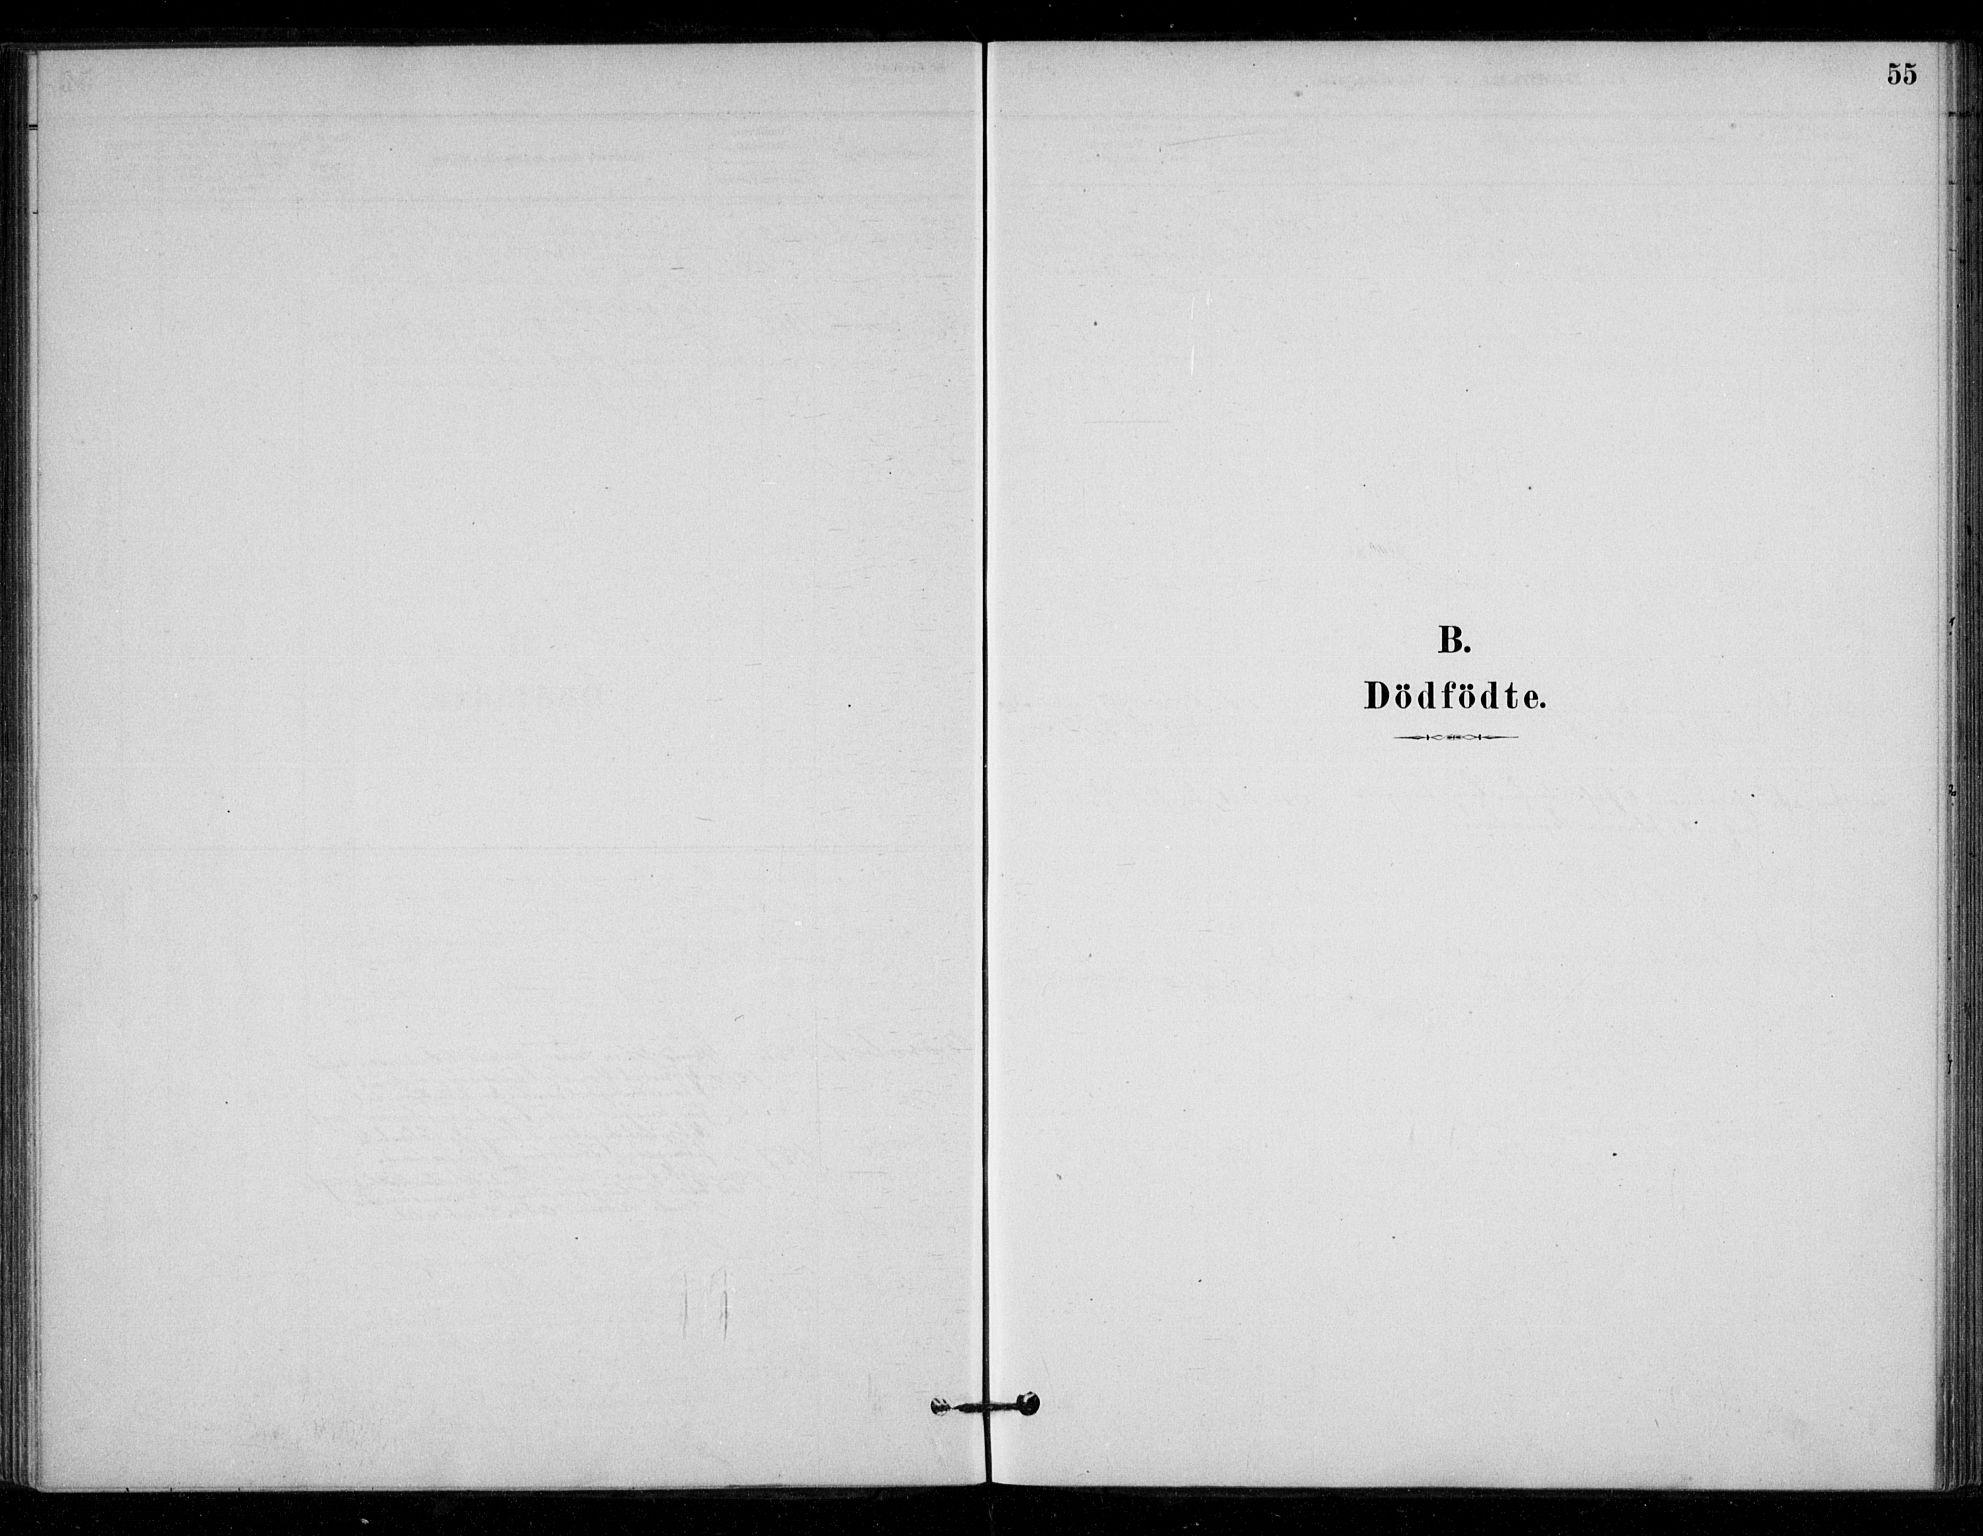 SAT, Ministerialprotokoller, klokkerbøker og fødselsregistre - Sør-Trøndelag, 670/L0836: Parish register (official) no. 670A01, 1879-1904, p. 55